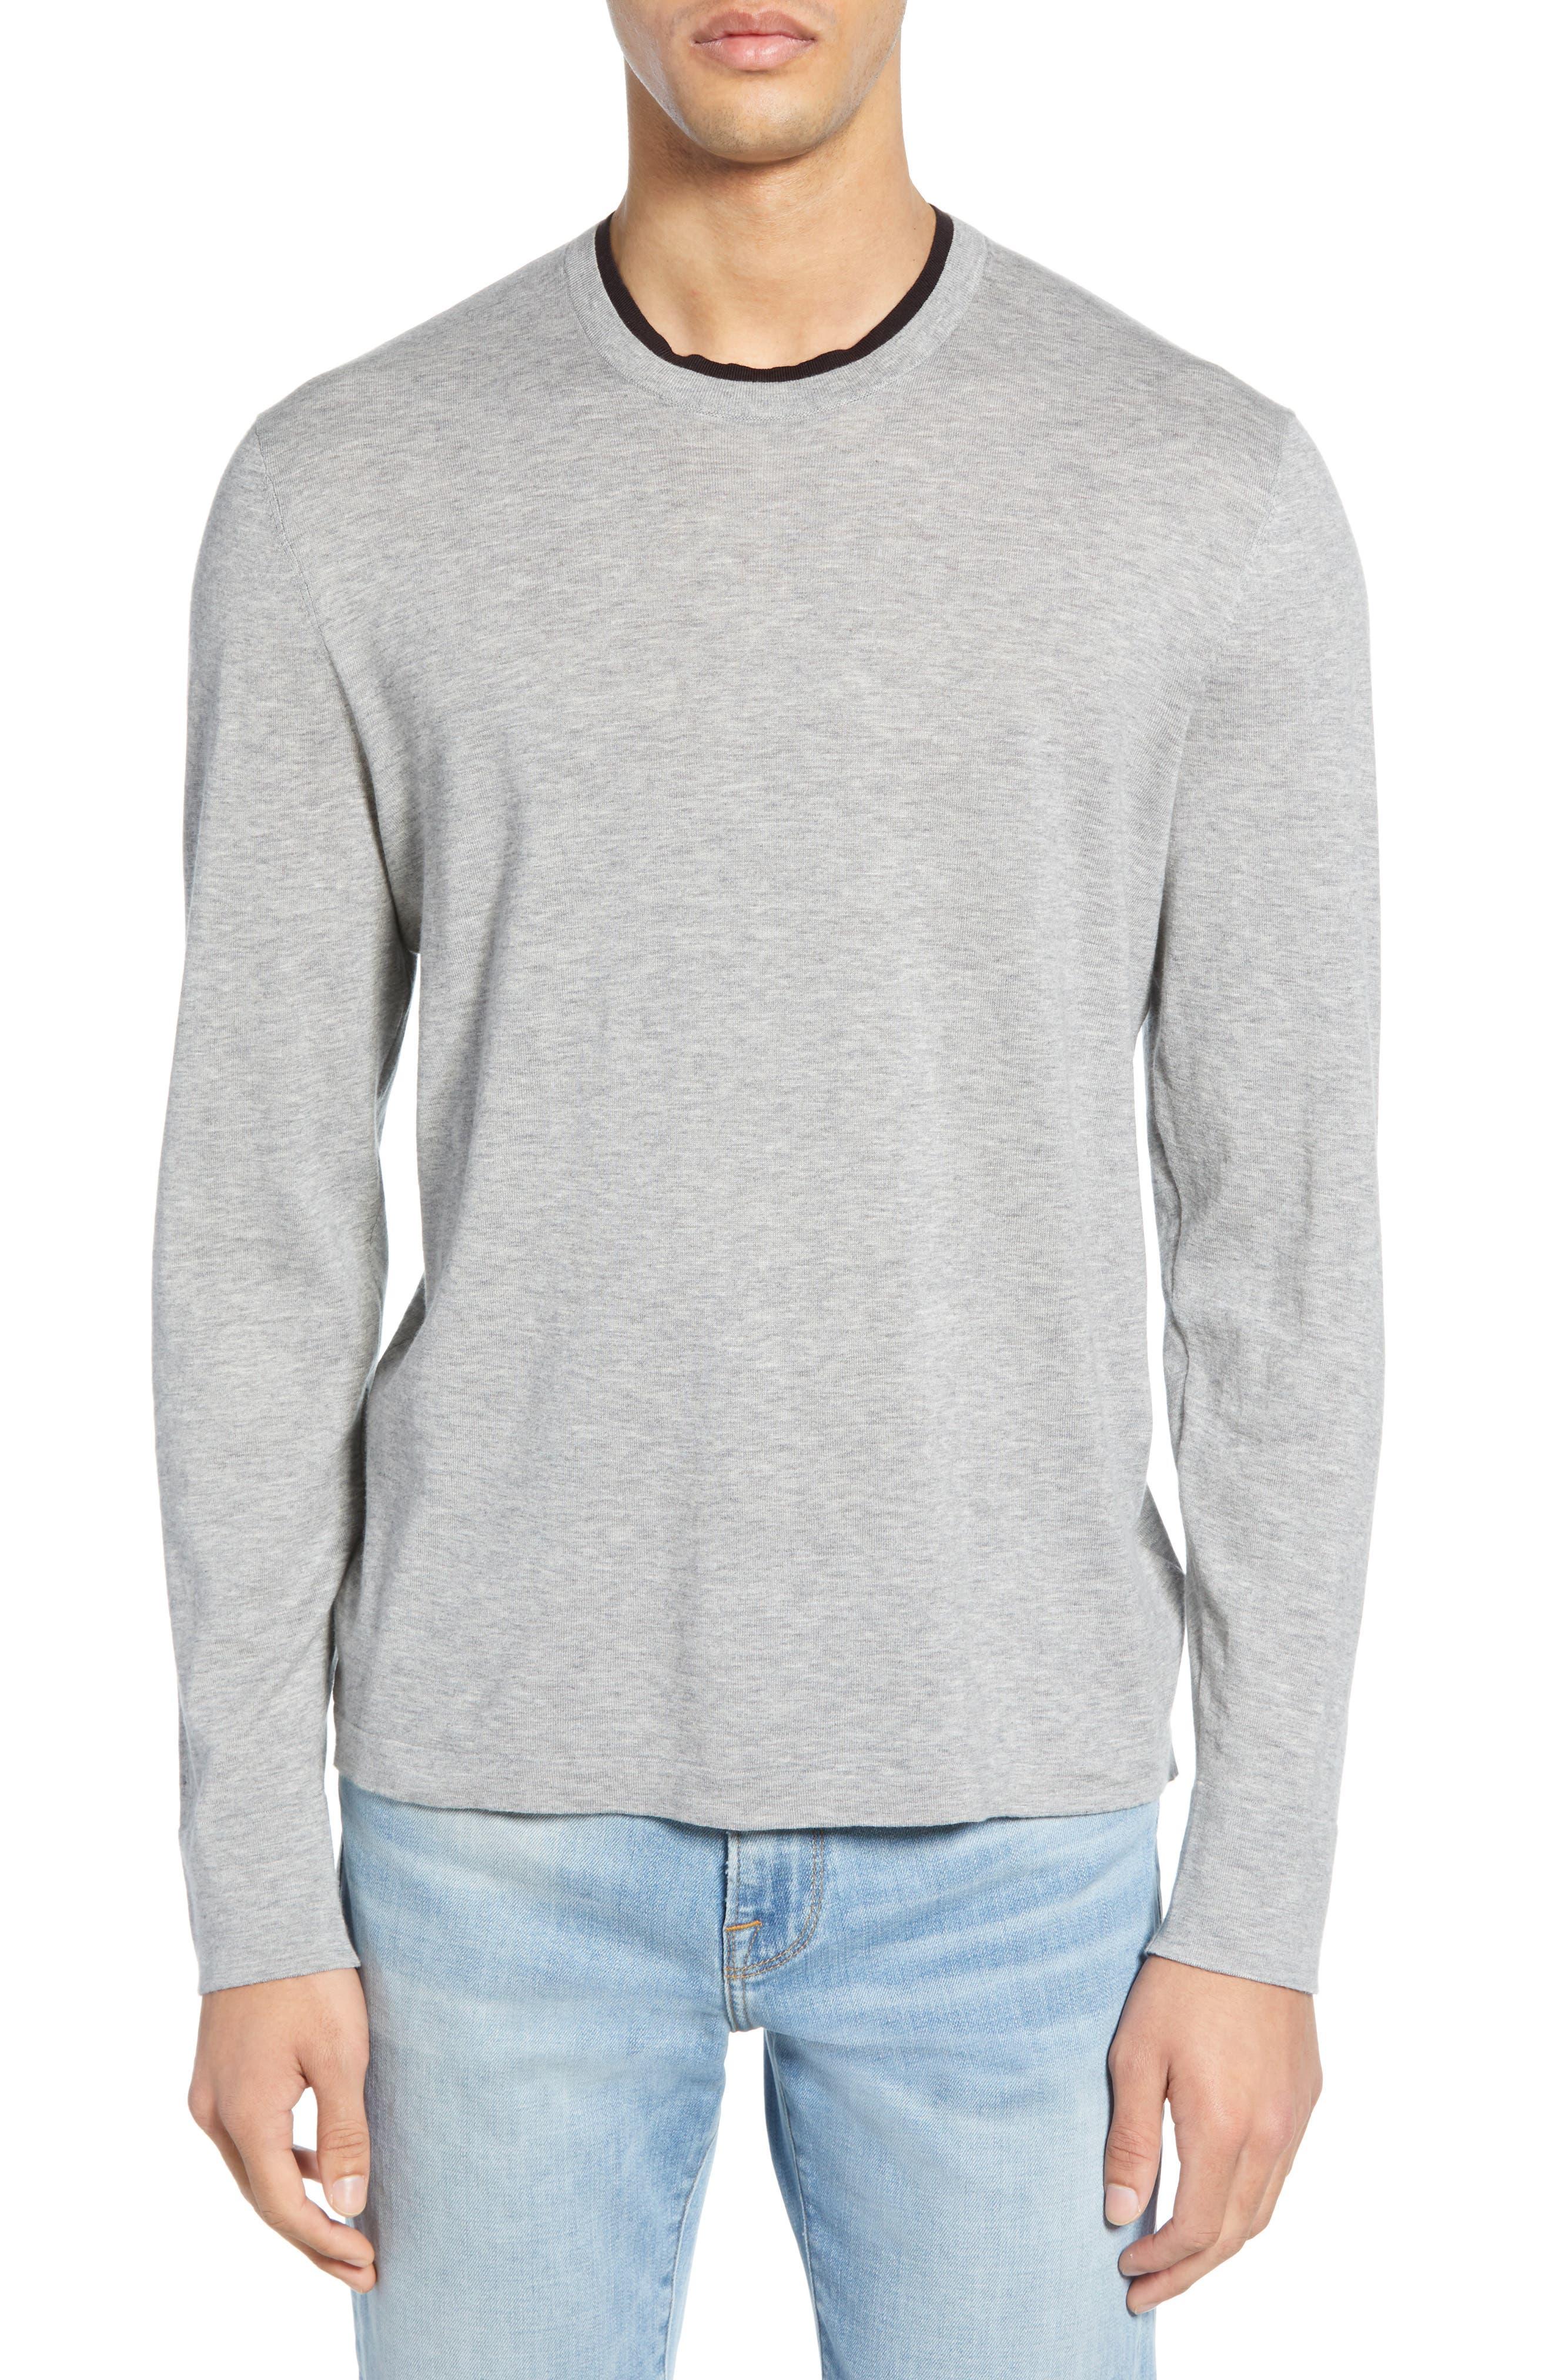 James Perse Slim Fit Cotton Crewneck Sweater, Grey